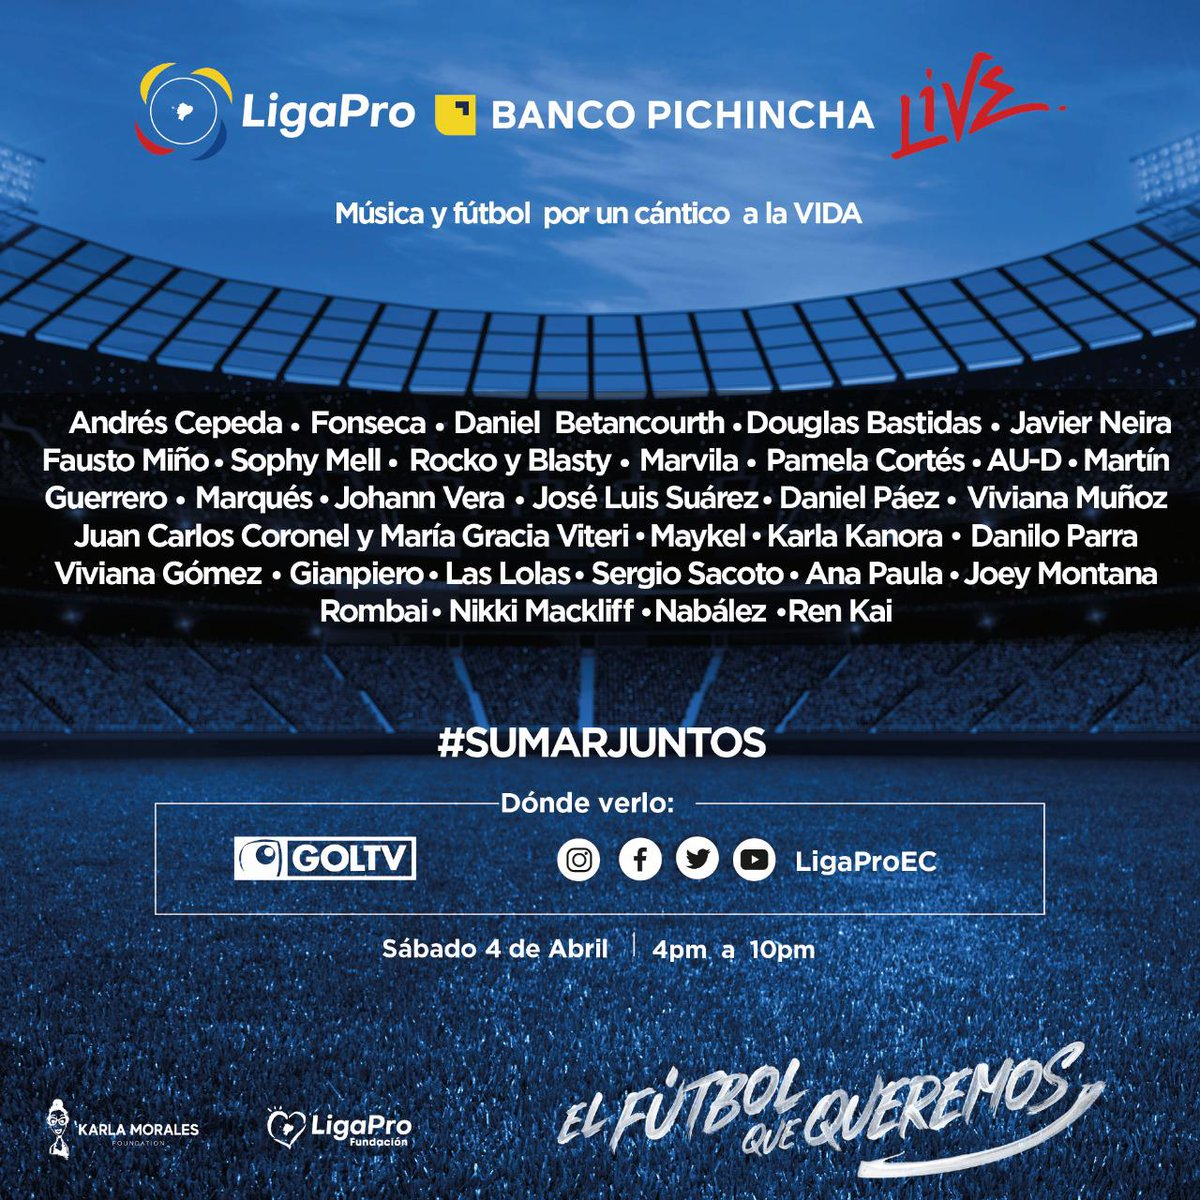 Hoy todos a #SumarJuntos @BancoPichincha Gran iniciativa https://t.co/gRlbxEcQYG